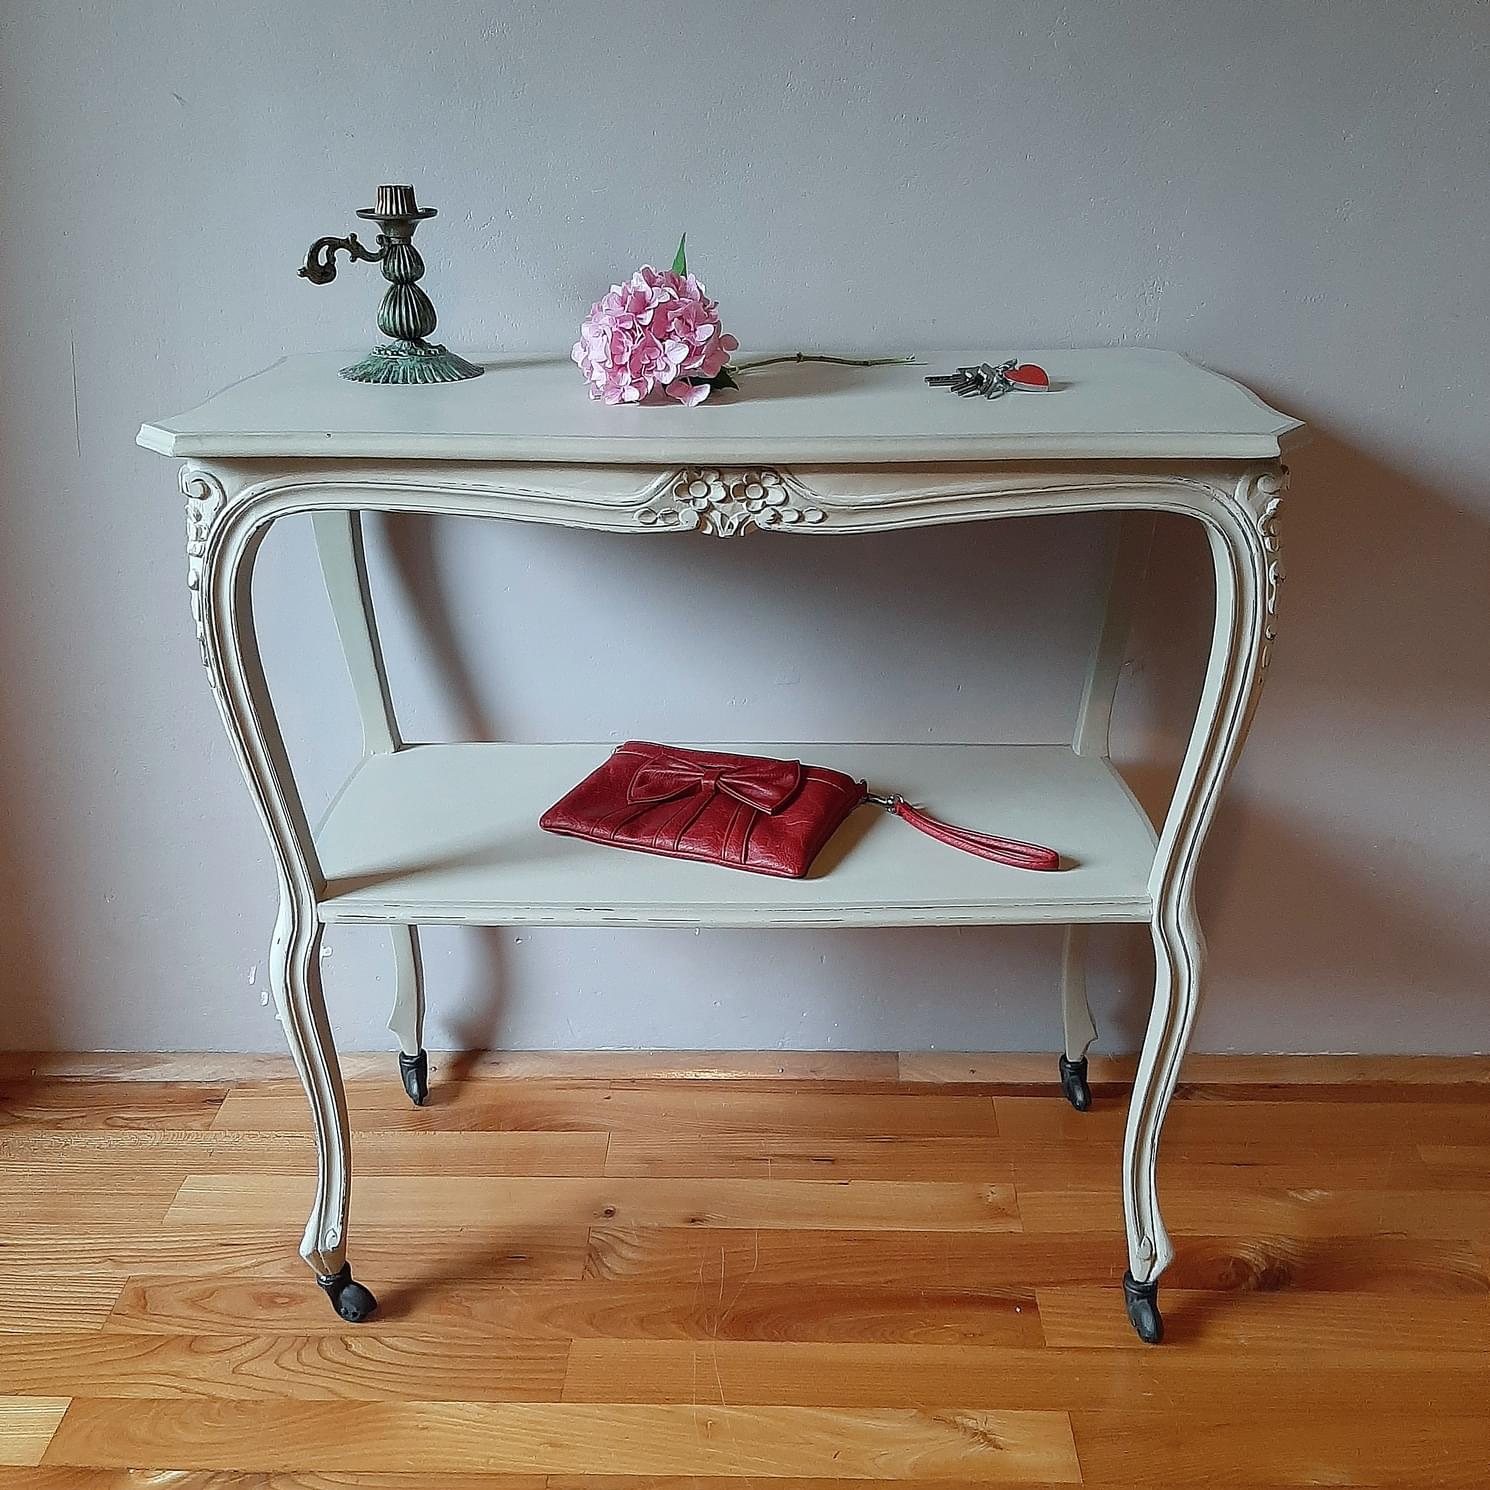 Stara italjanska miza